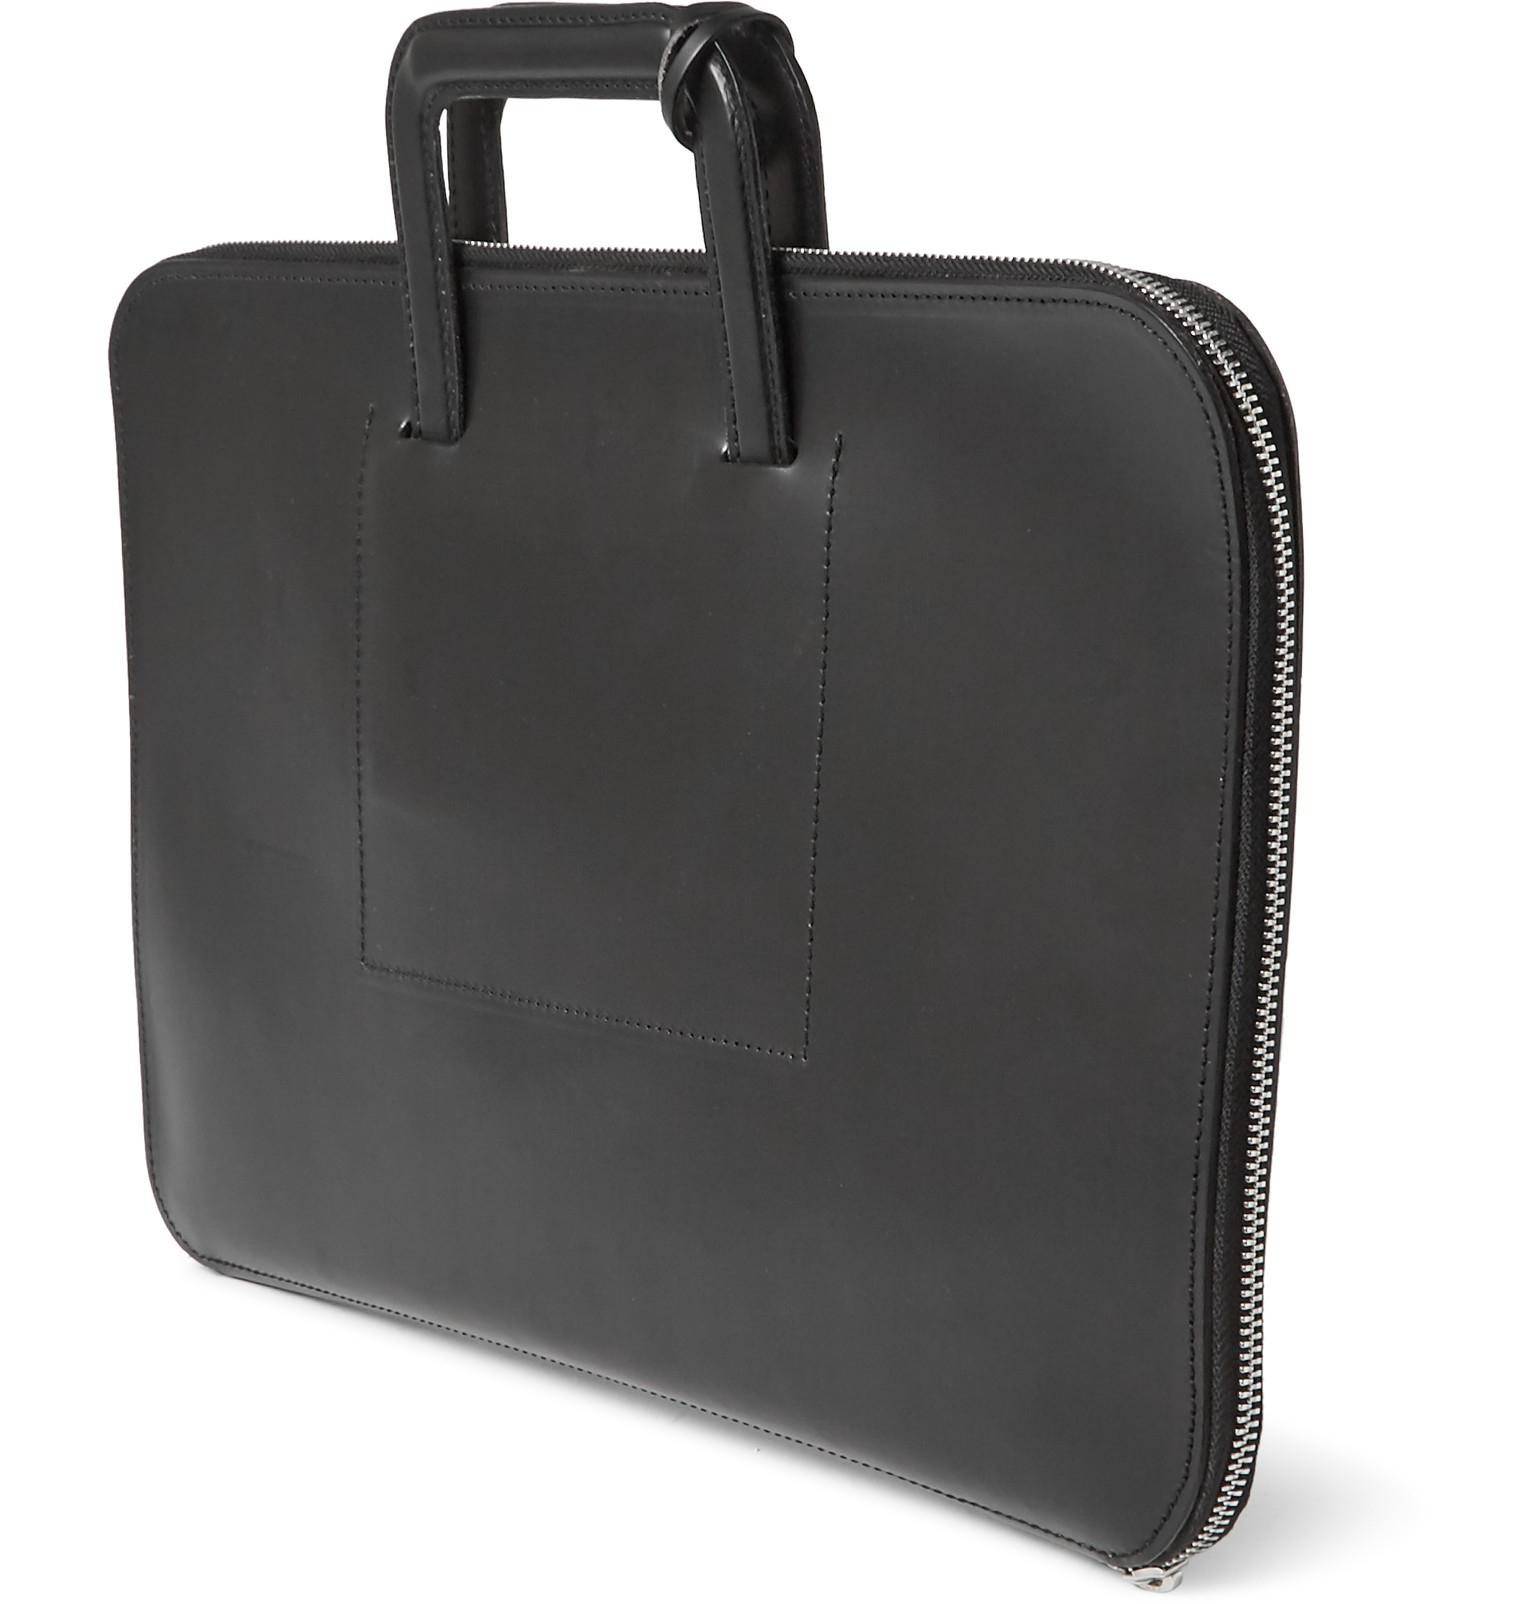 Kingsman + Swaine Adeney Brigg Salisbury Leather Folio in Black for ... 8359c9561b1e5